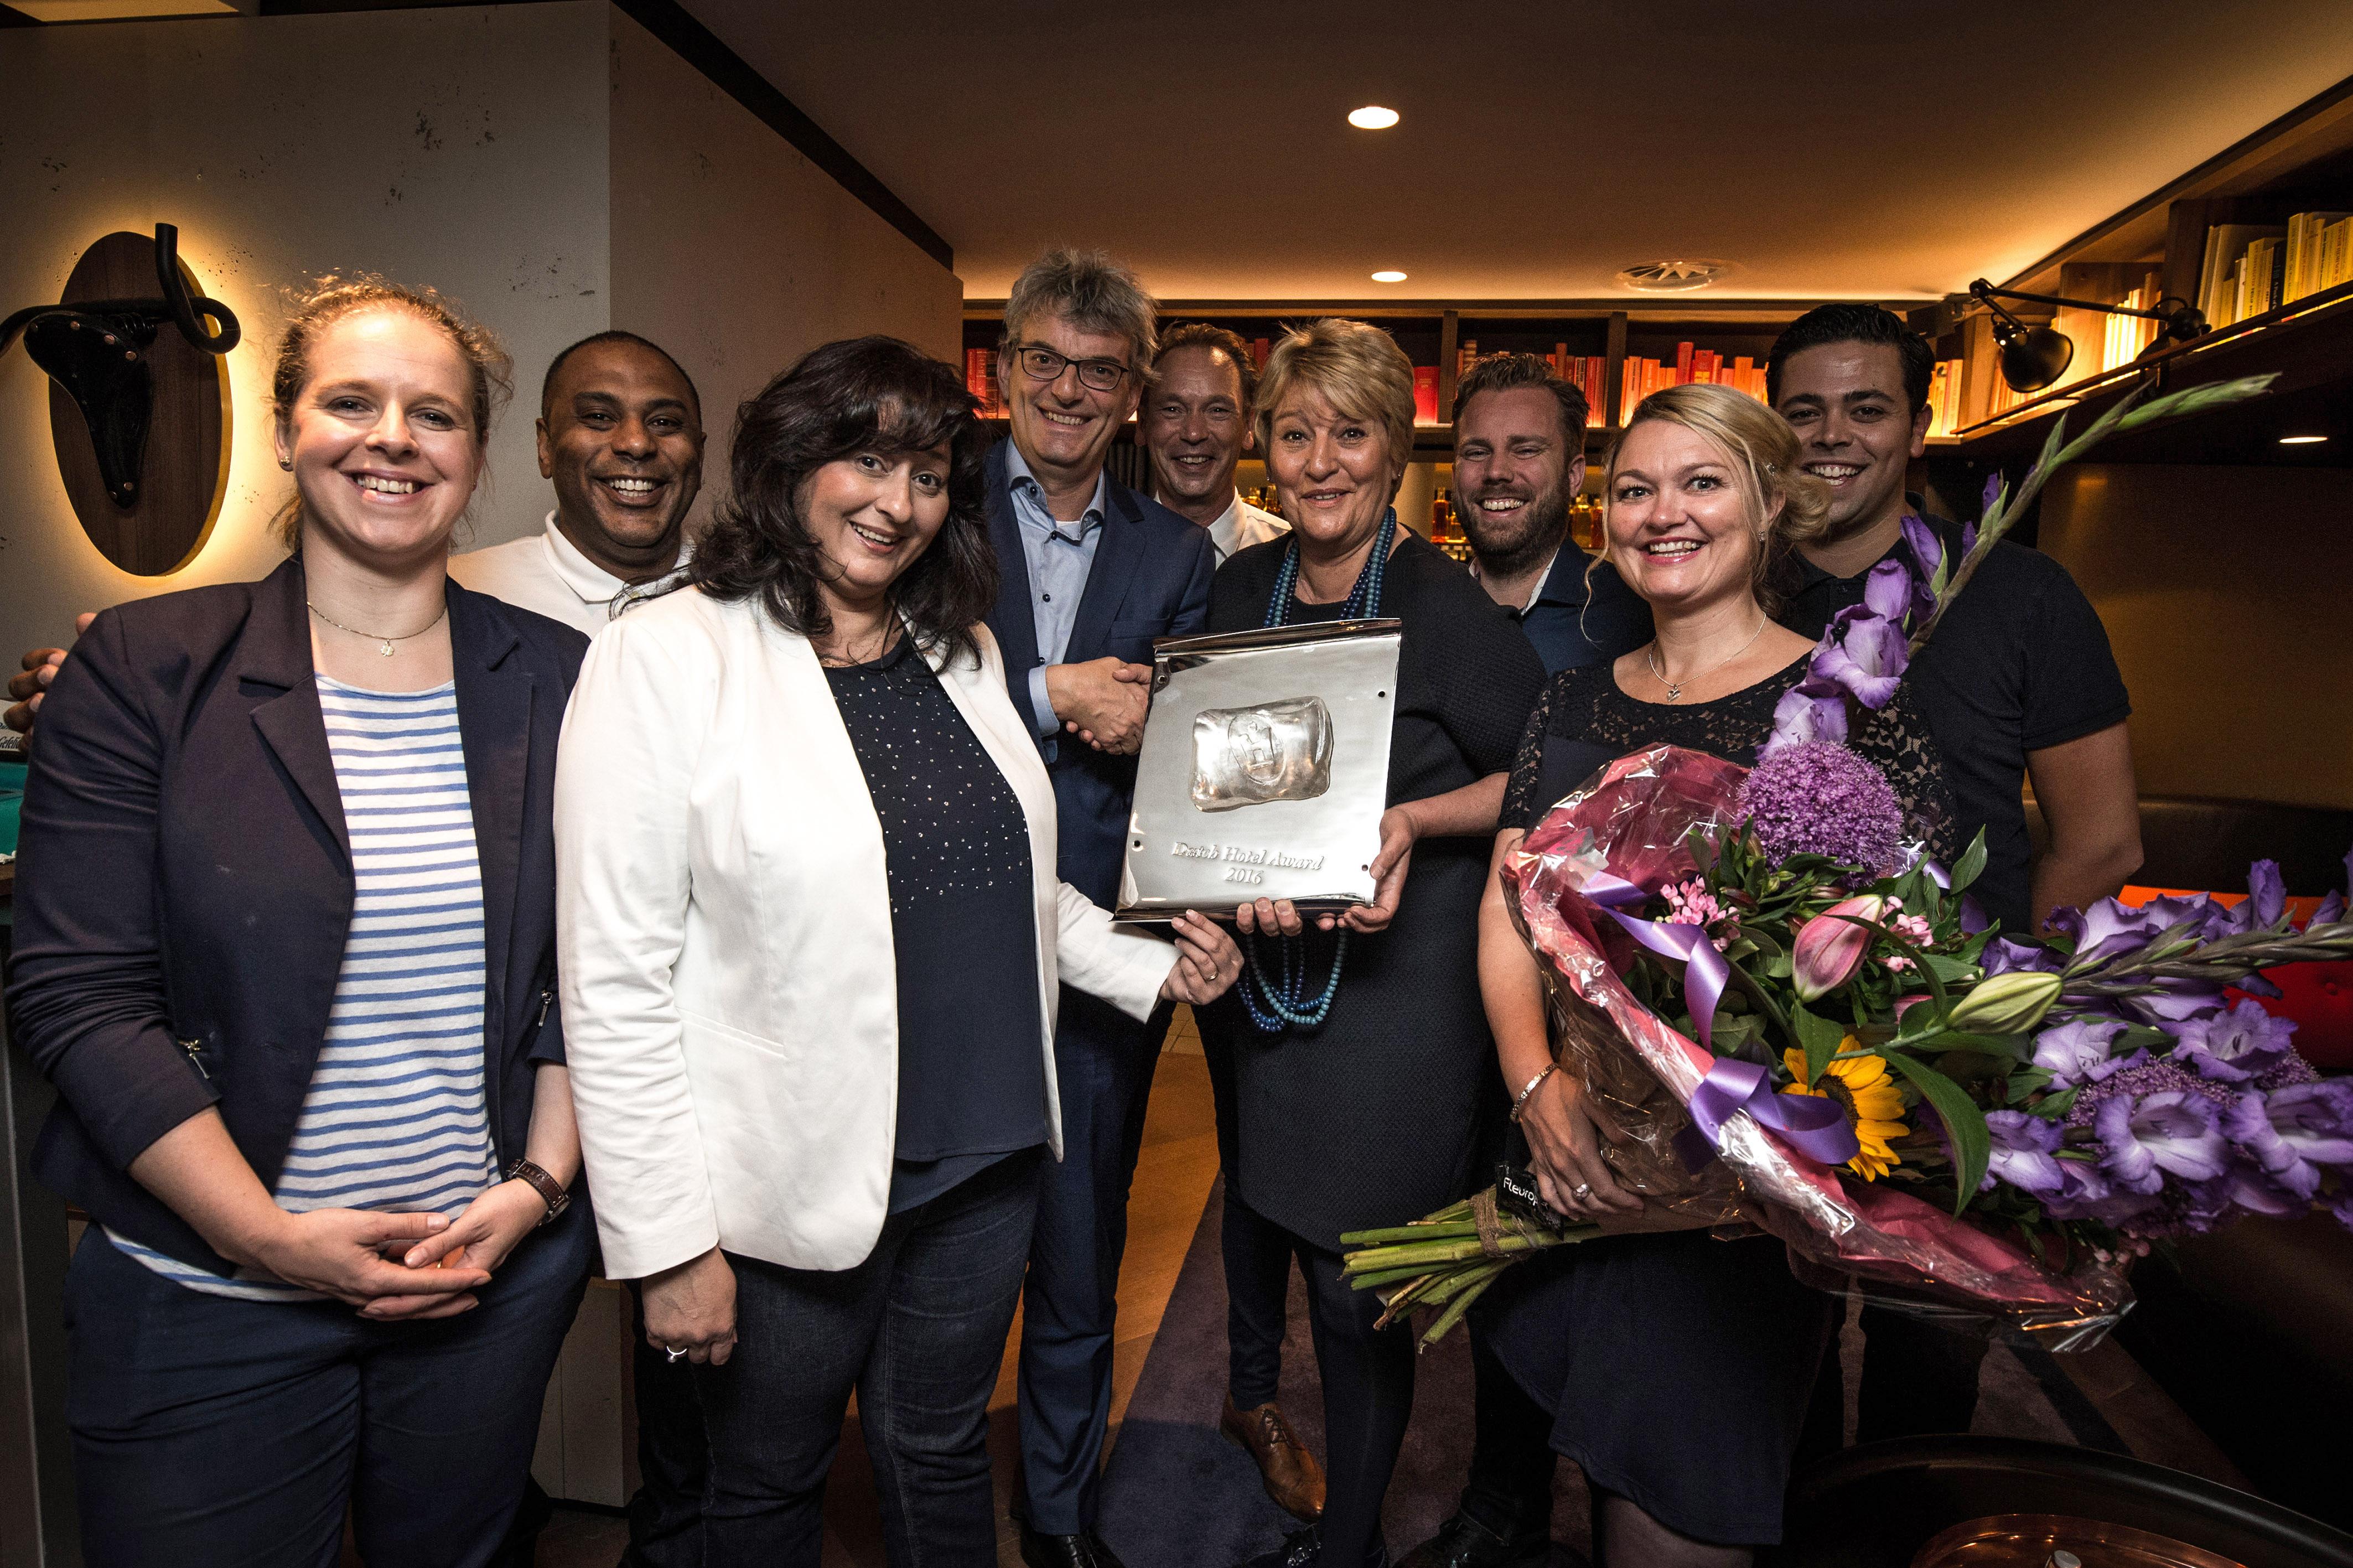 INK Hotel ontvangt wandplaquette na winst Dutch Hotel Award 2016